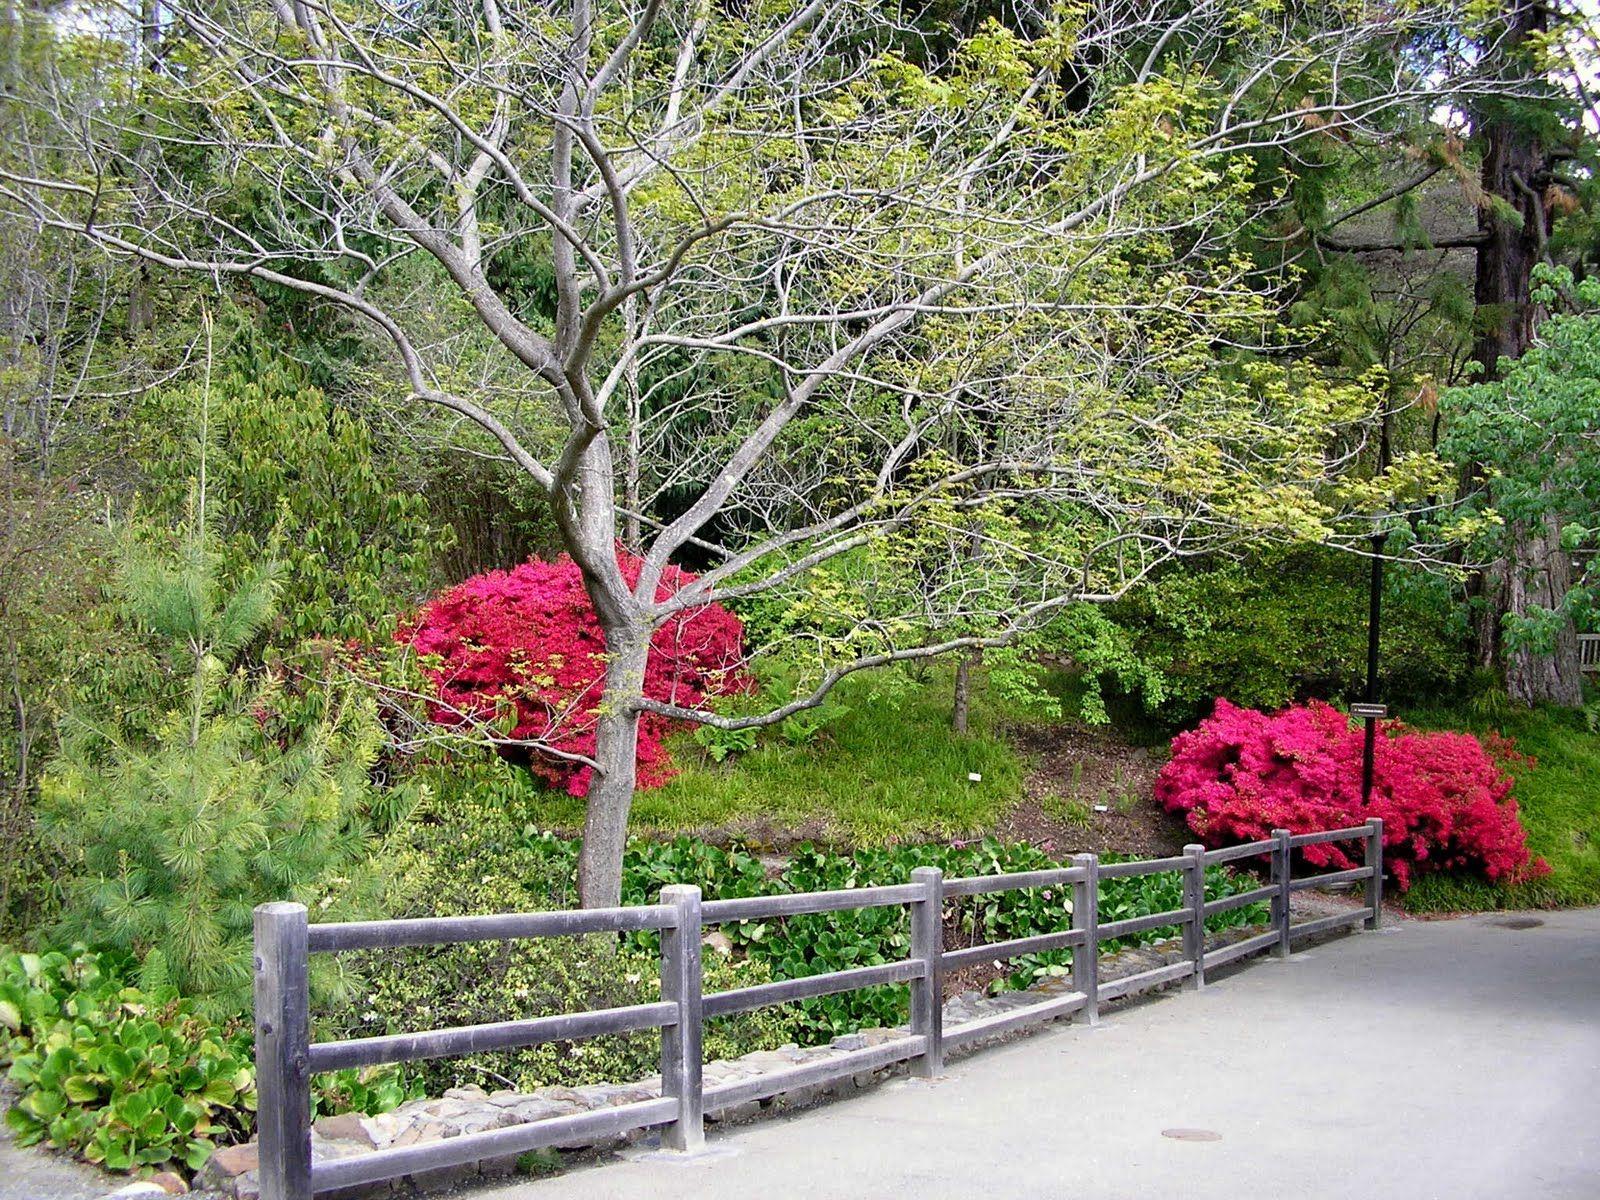 Gardens Just prettyand peaceful Garden Zen